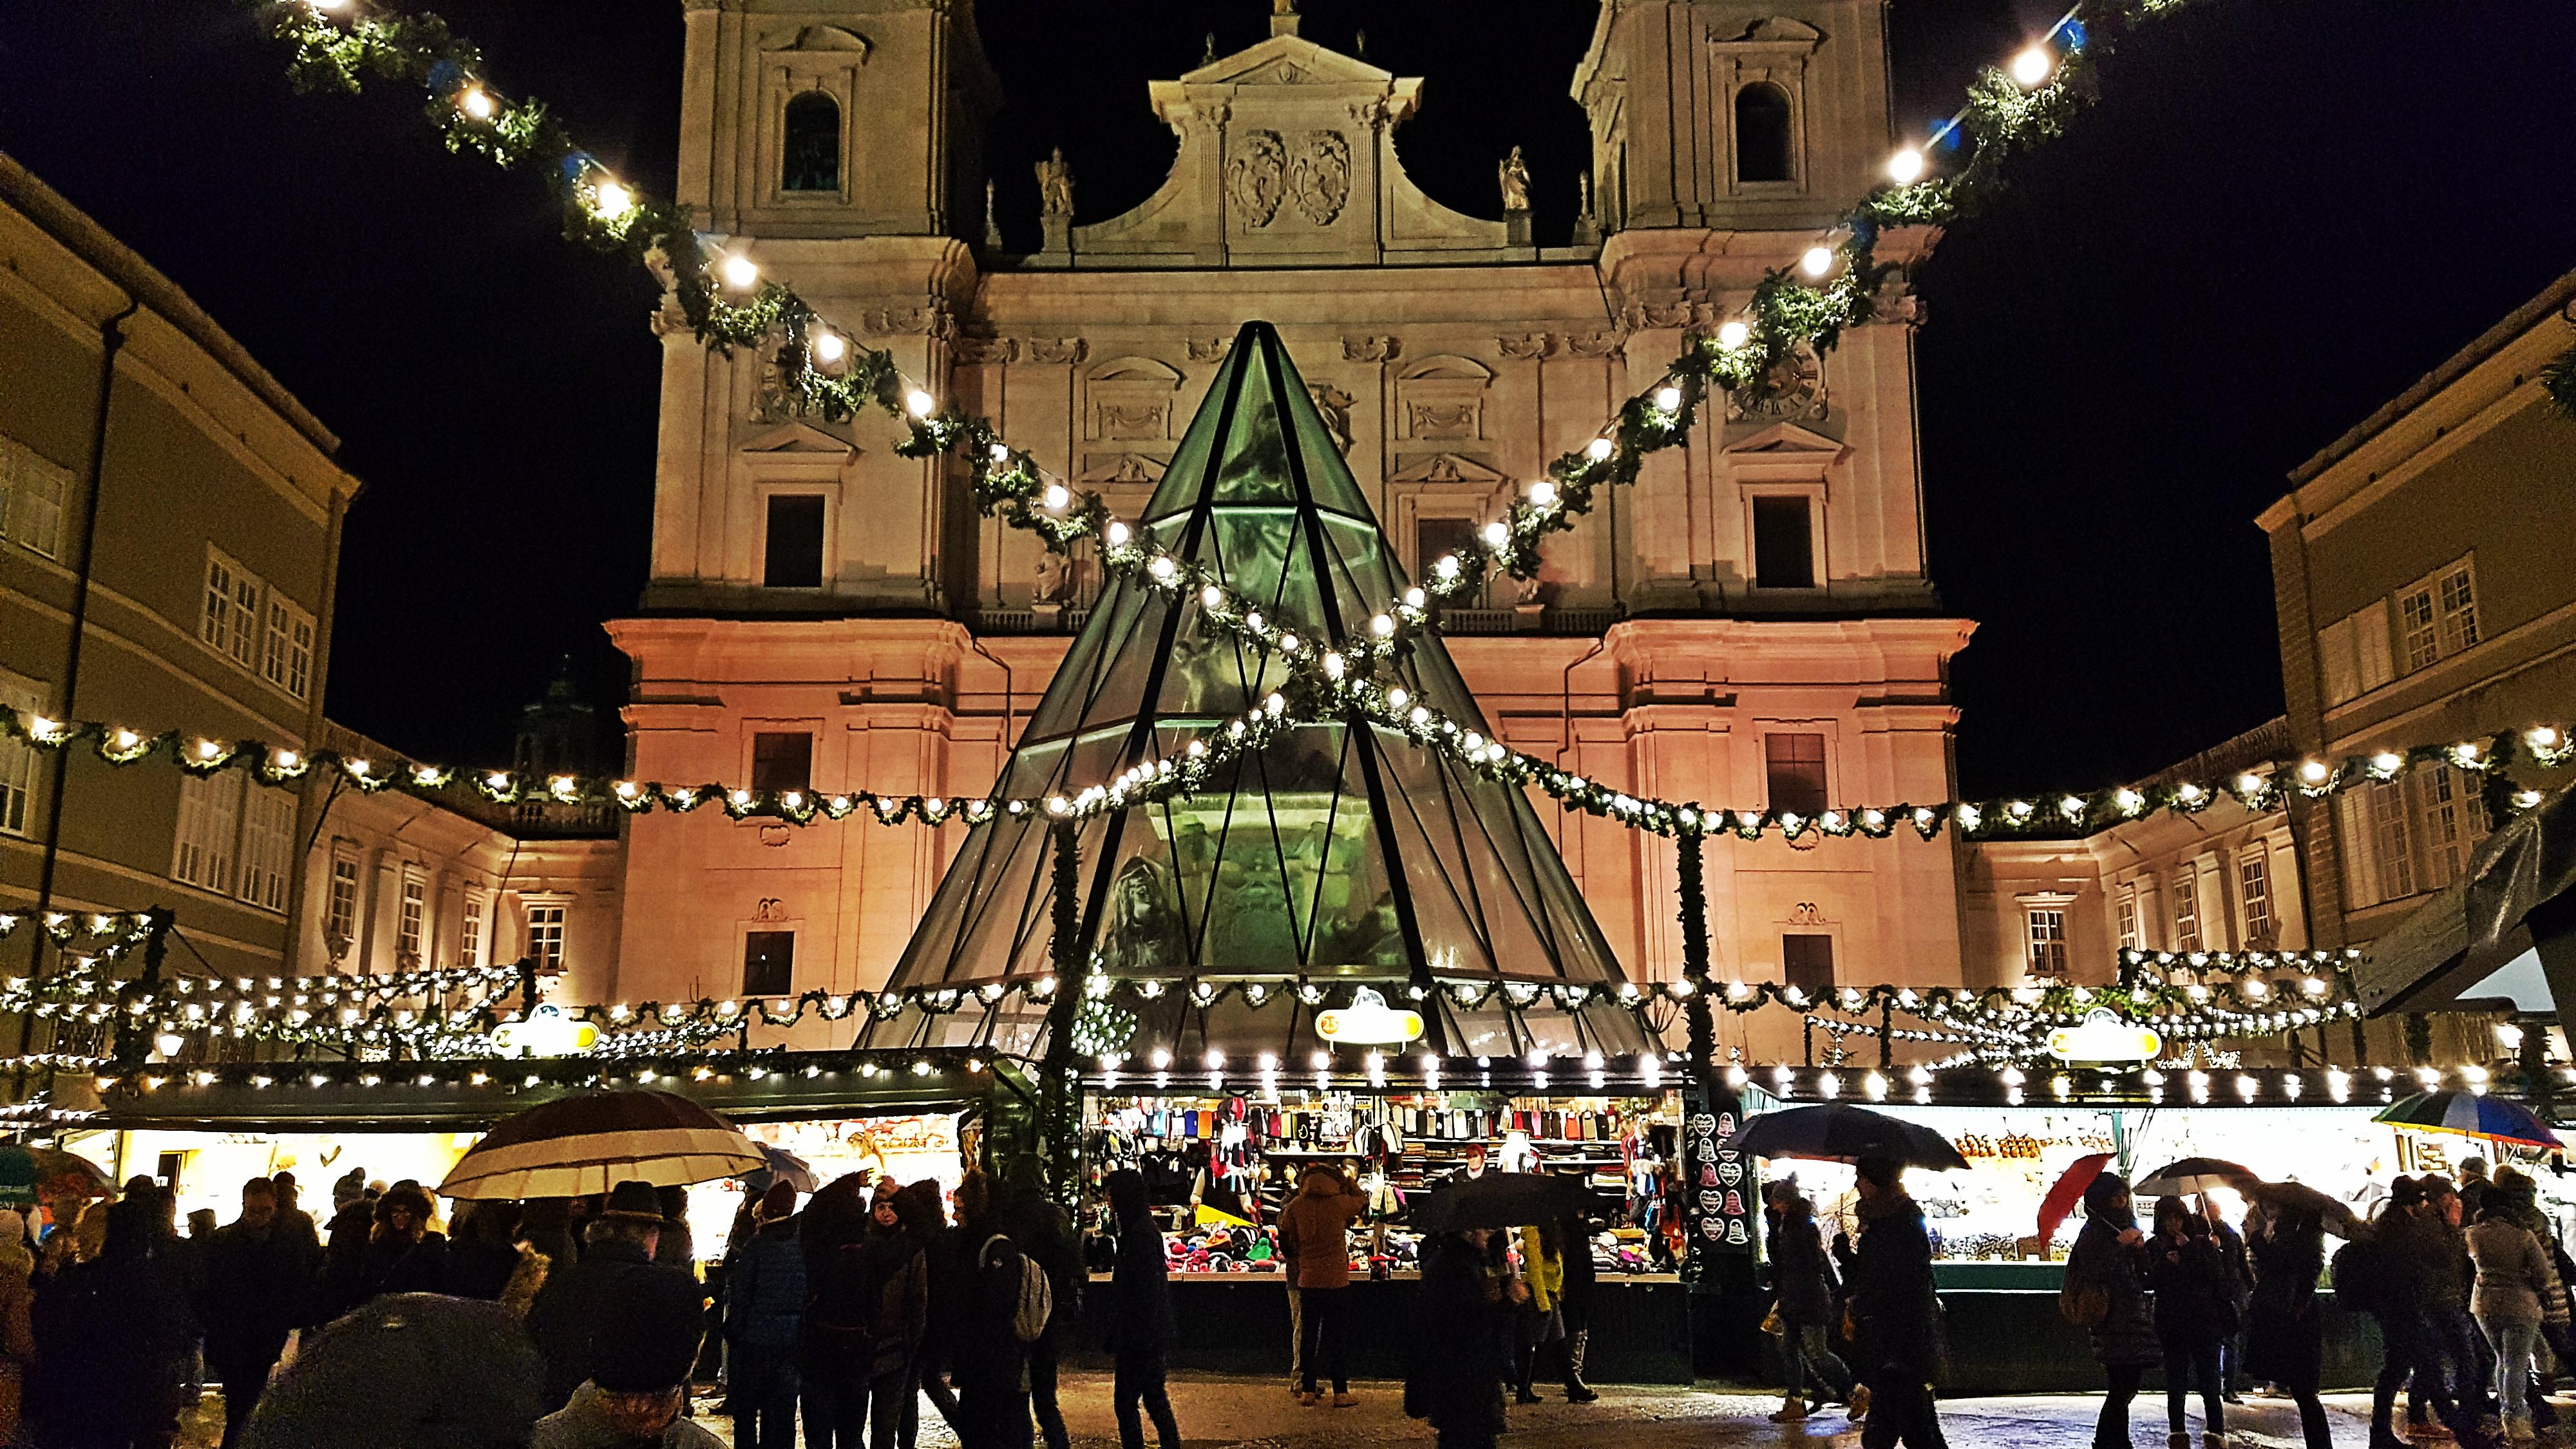 Salzburg Christmas Market.File Christmas Market Salzburg Austria Jpg Wikimedia Commons